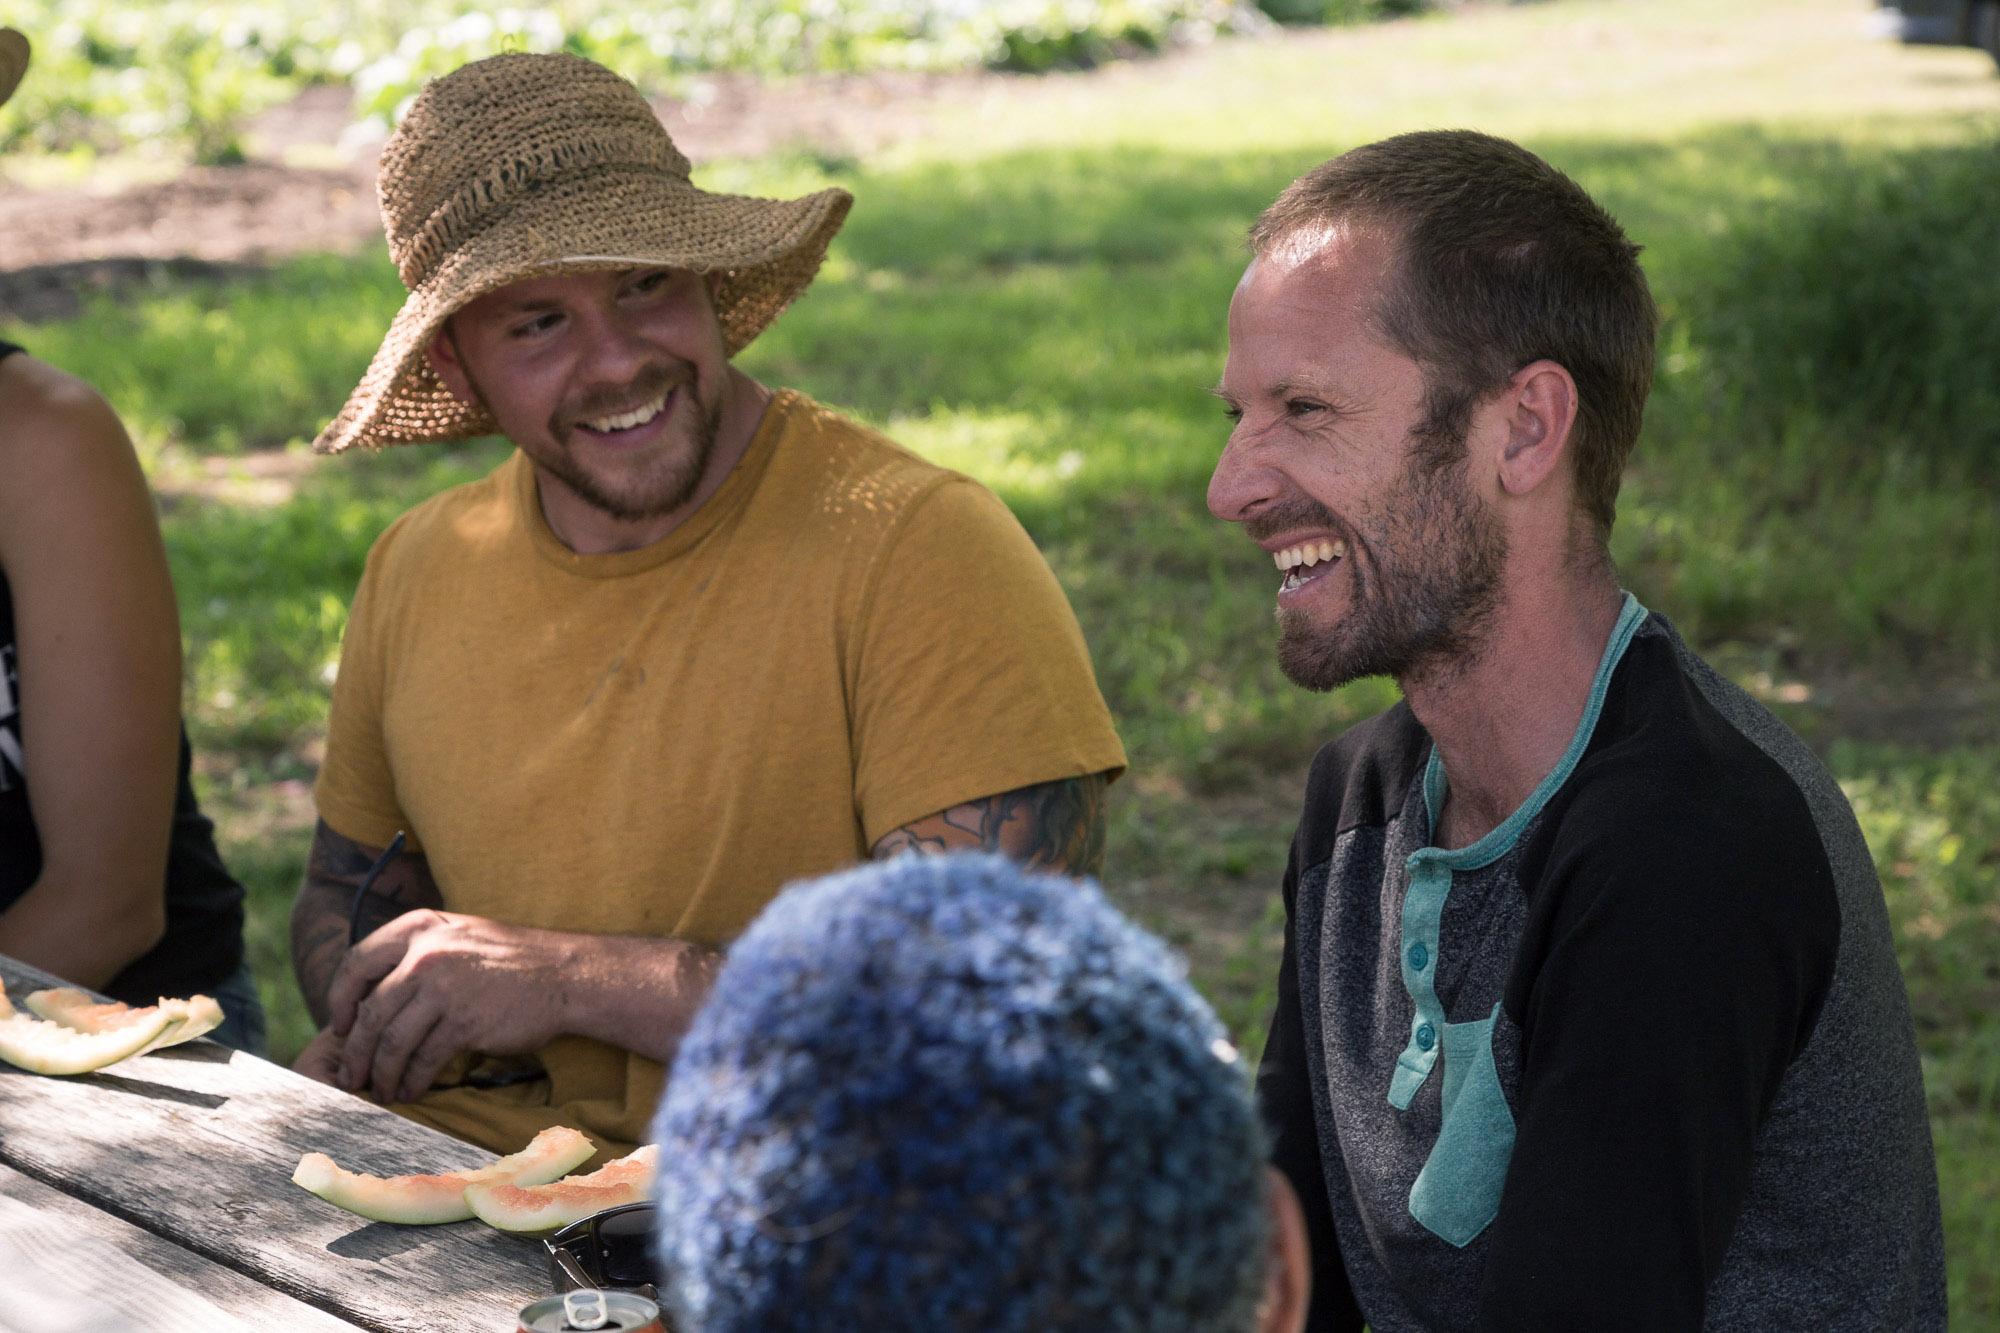 DUETS: Community Gardens